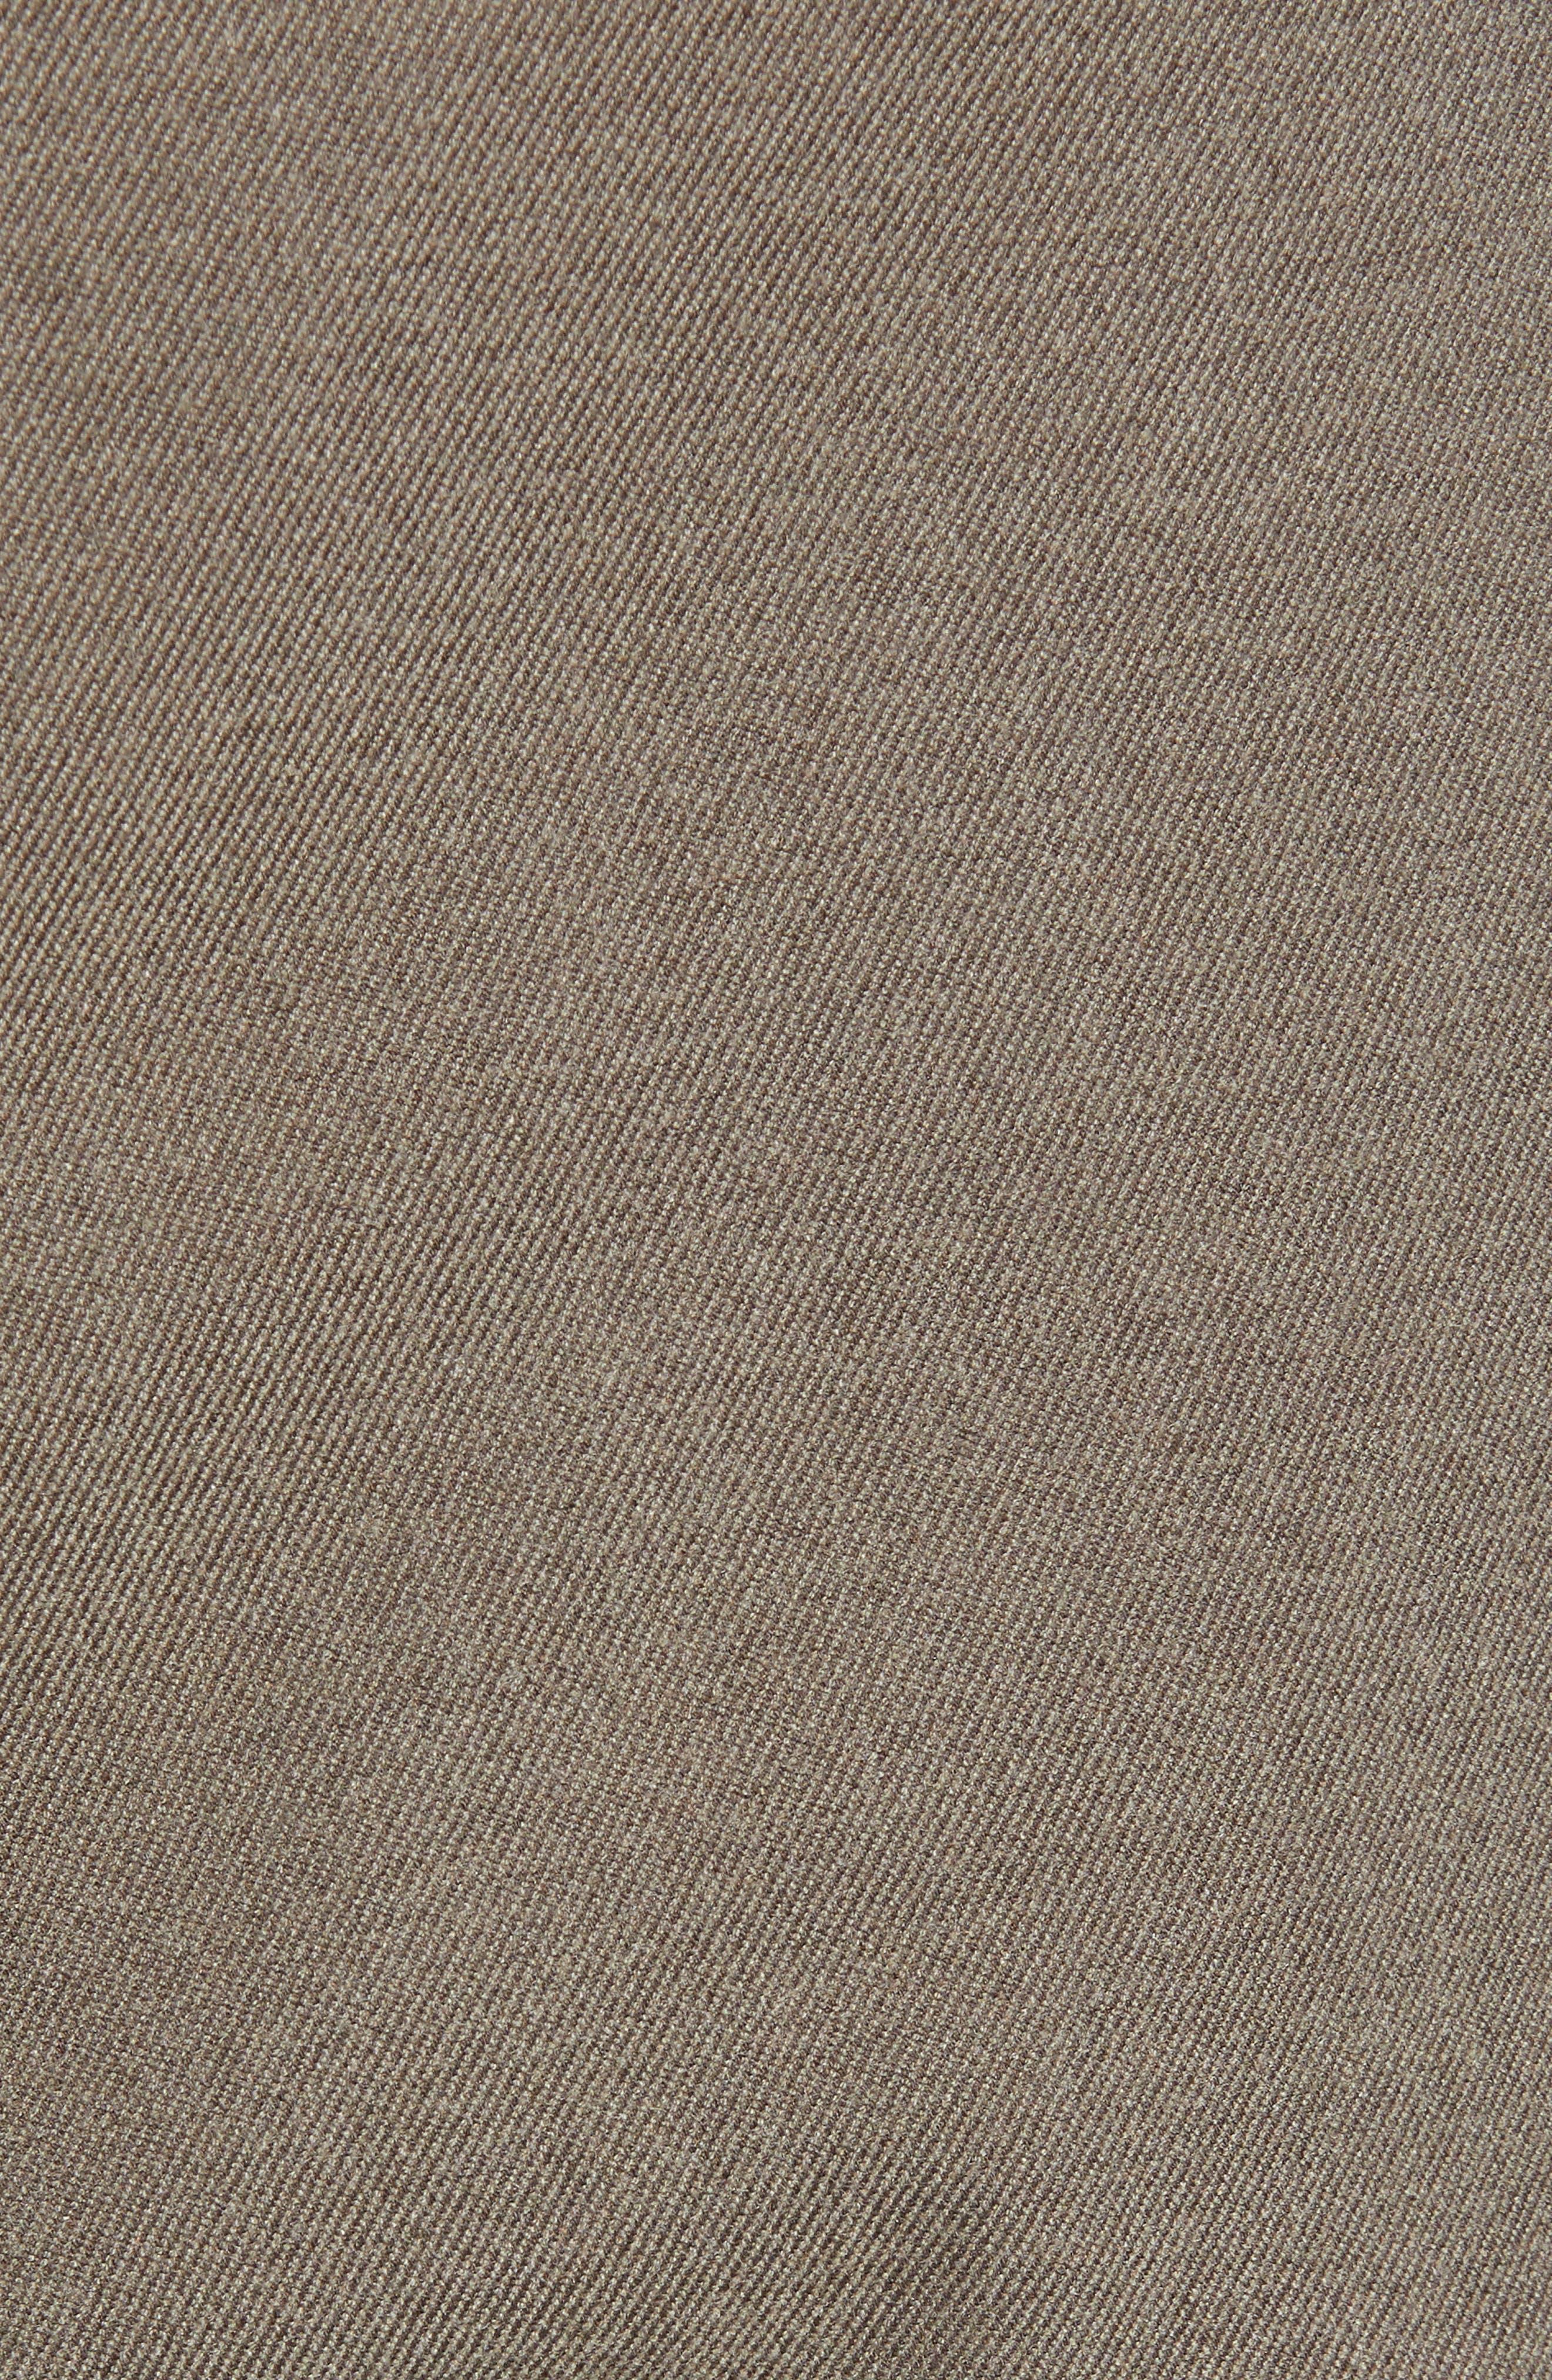 Semplin Slim Fit Brushed Trousers,                             Alternate thumbnail 5, color,                             NATURAL